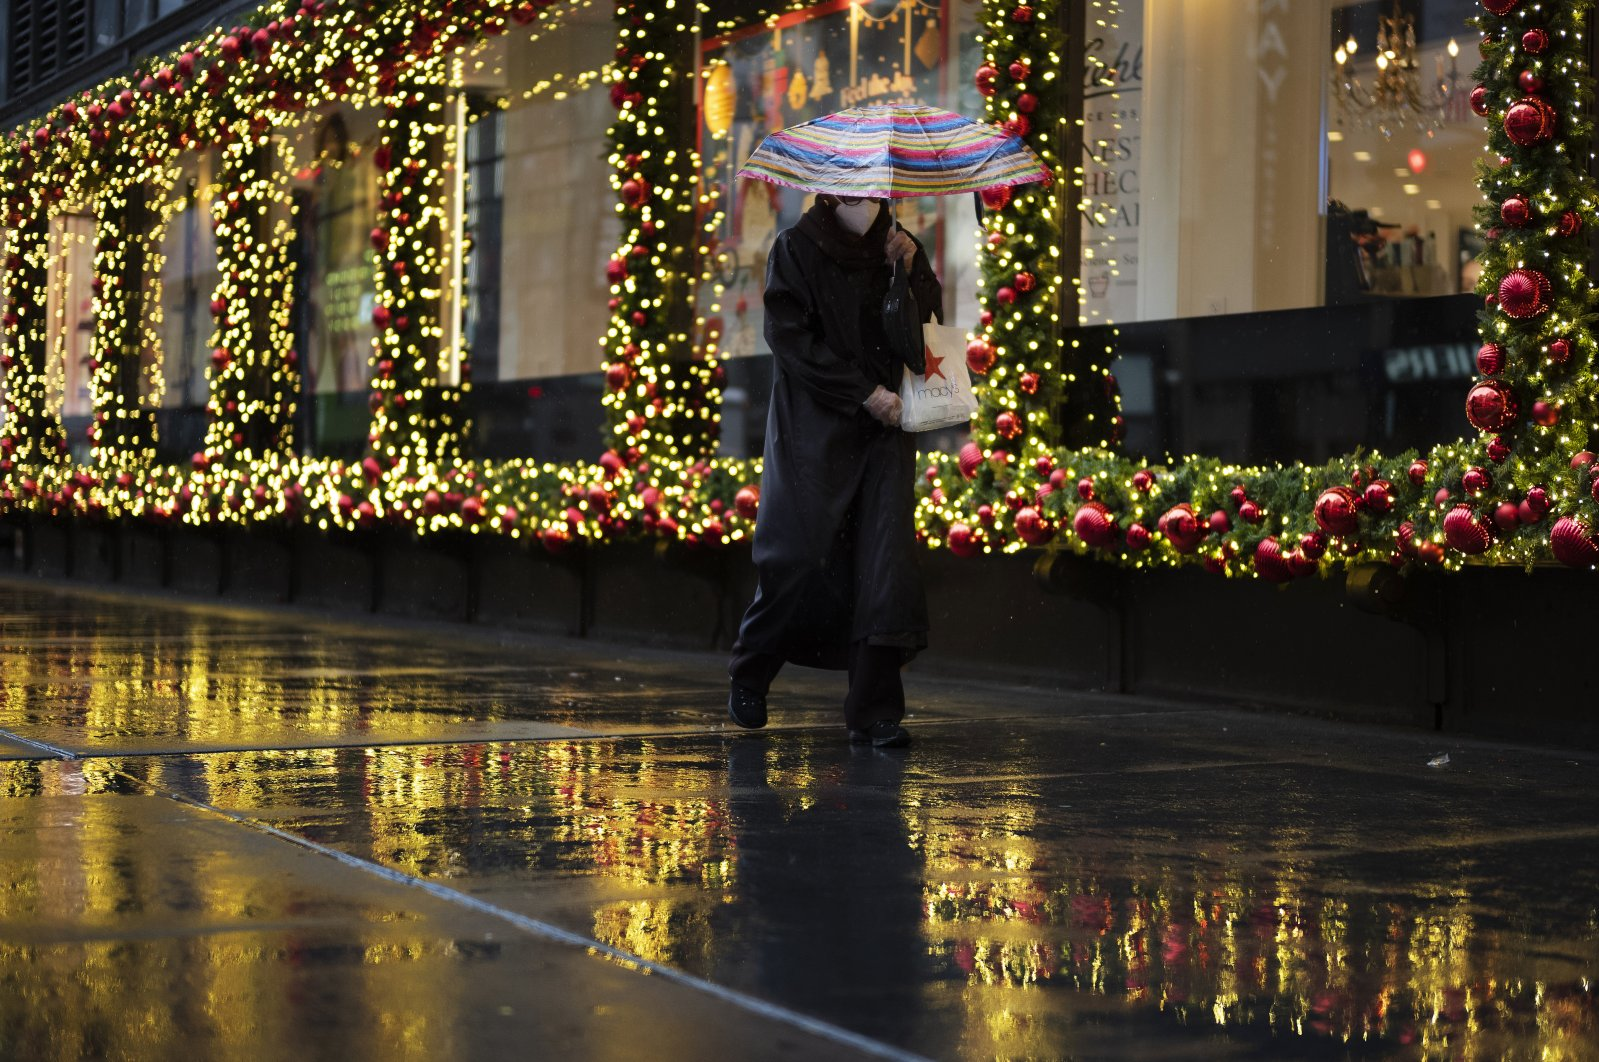 A shopper walks by holiday window displays in New York, U.S., Nov. 30, 2020. (AP Photo)